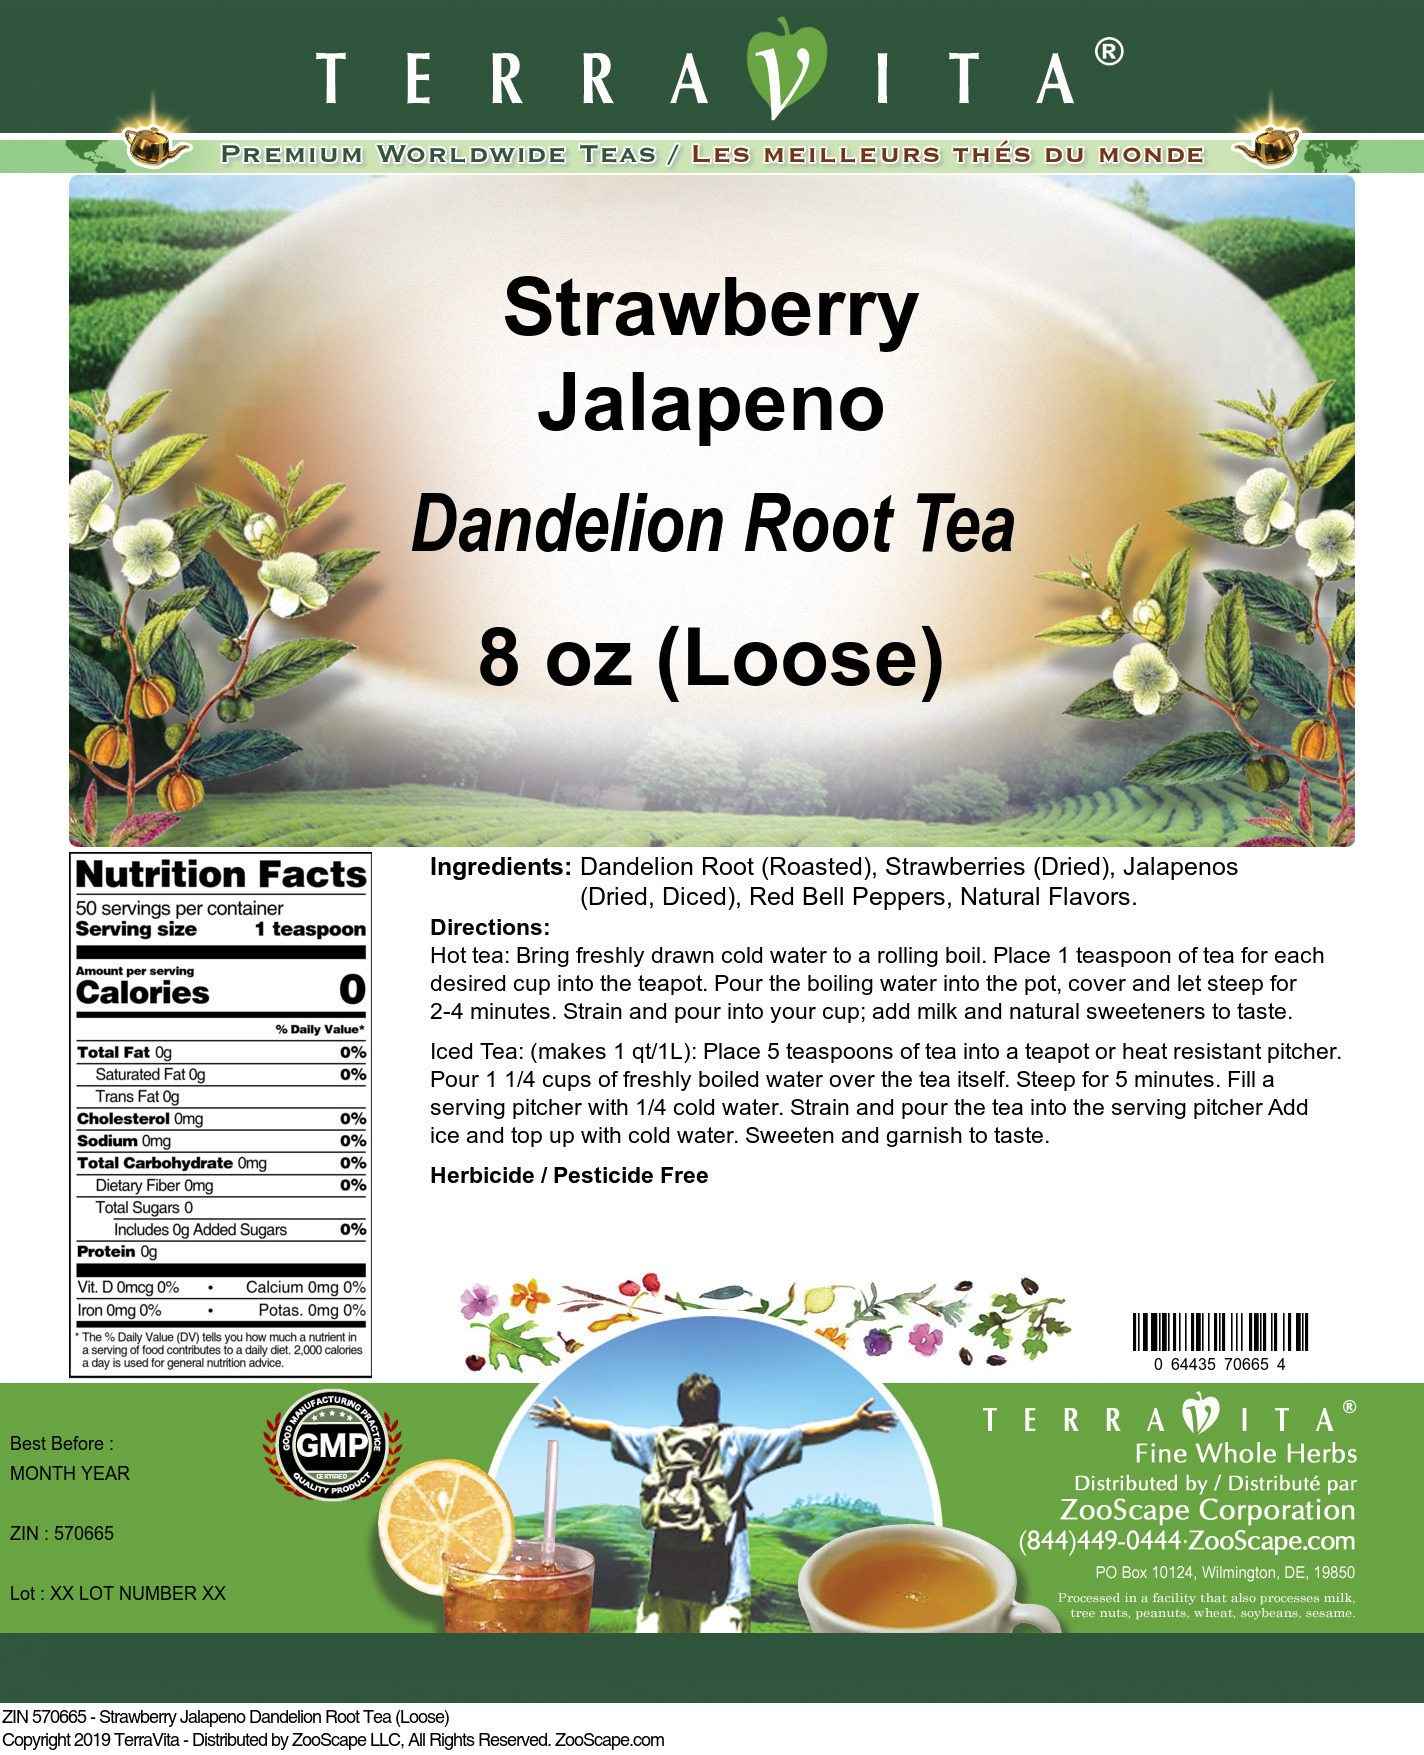 Strawberry Jalapeno Dandelion Root